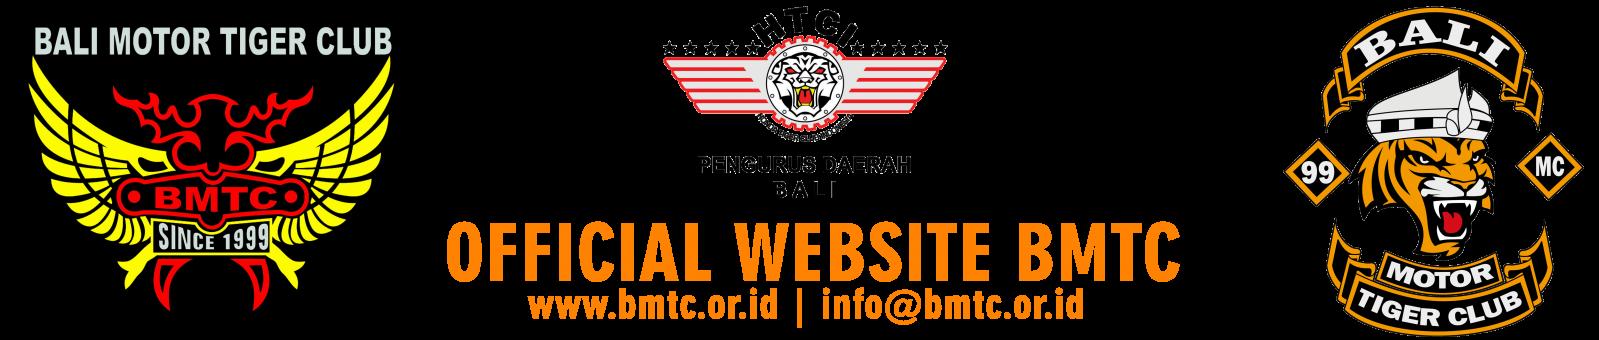 Bali Motor Tiger Club